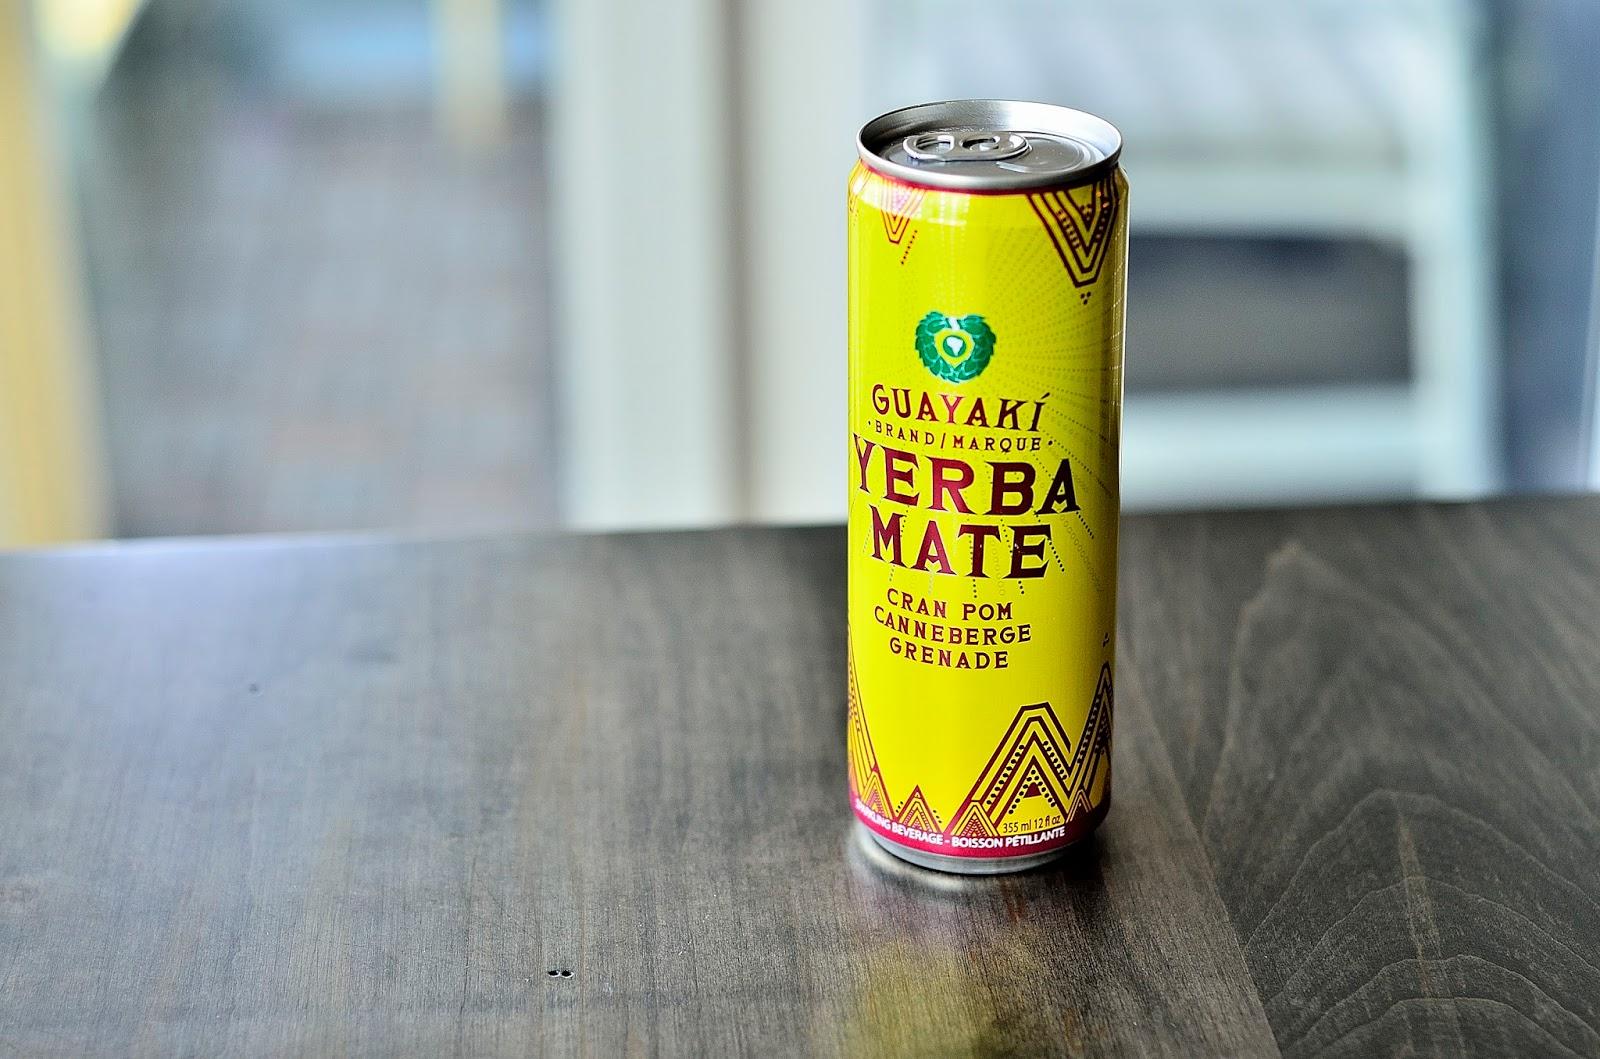 What I Drink At Work: Guayaki Yerba Mate Cran Pom